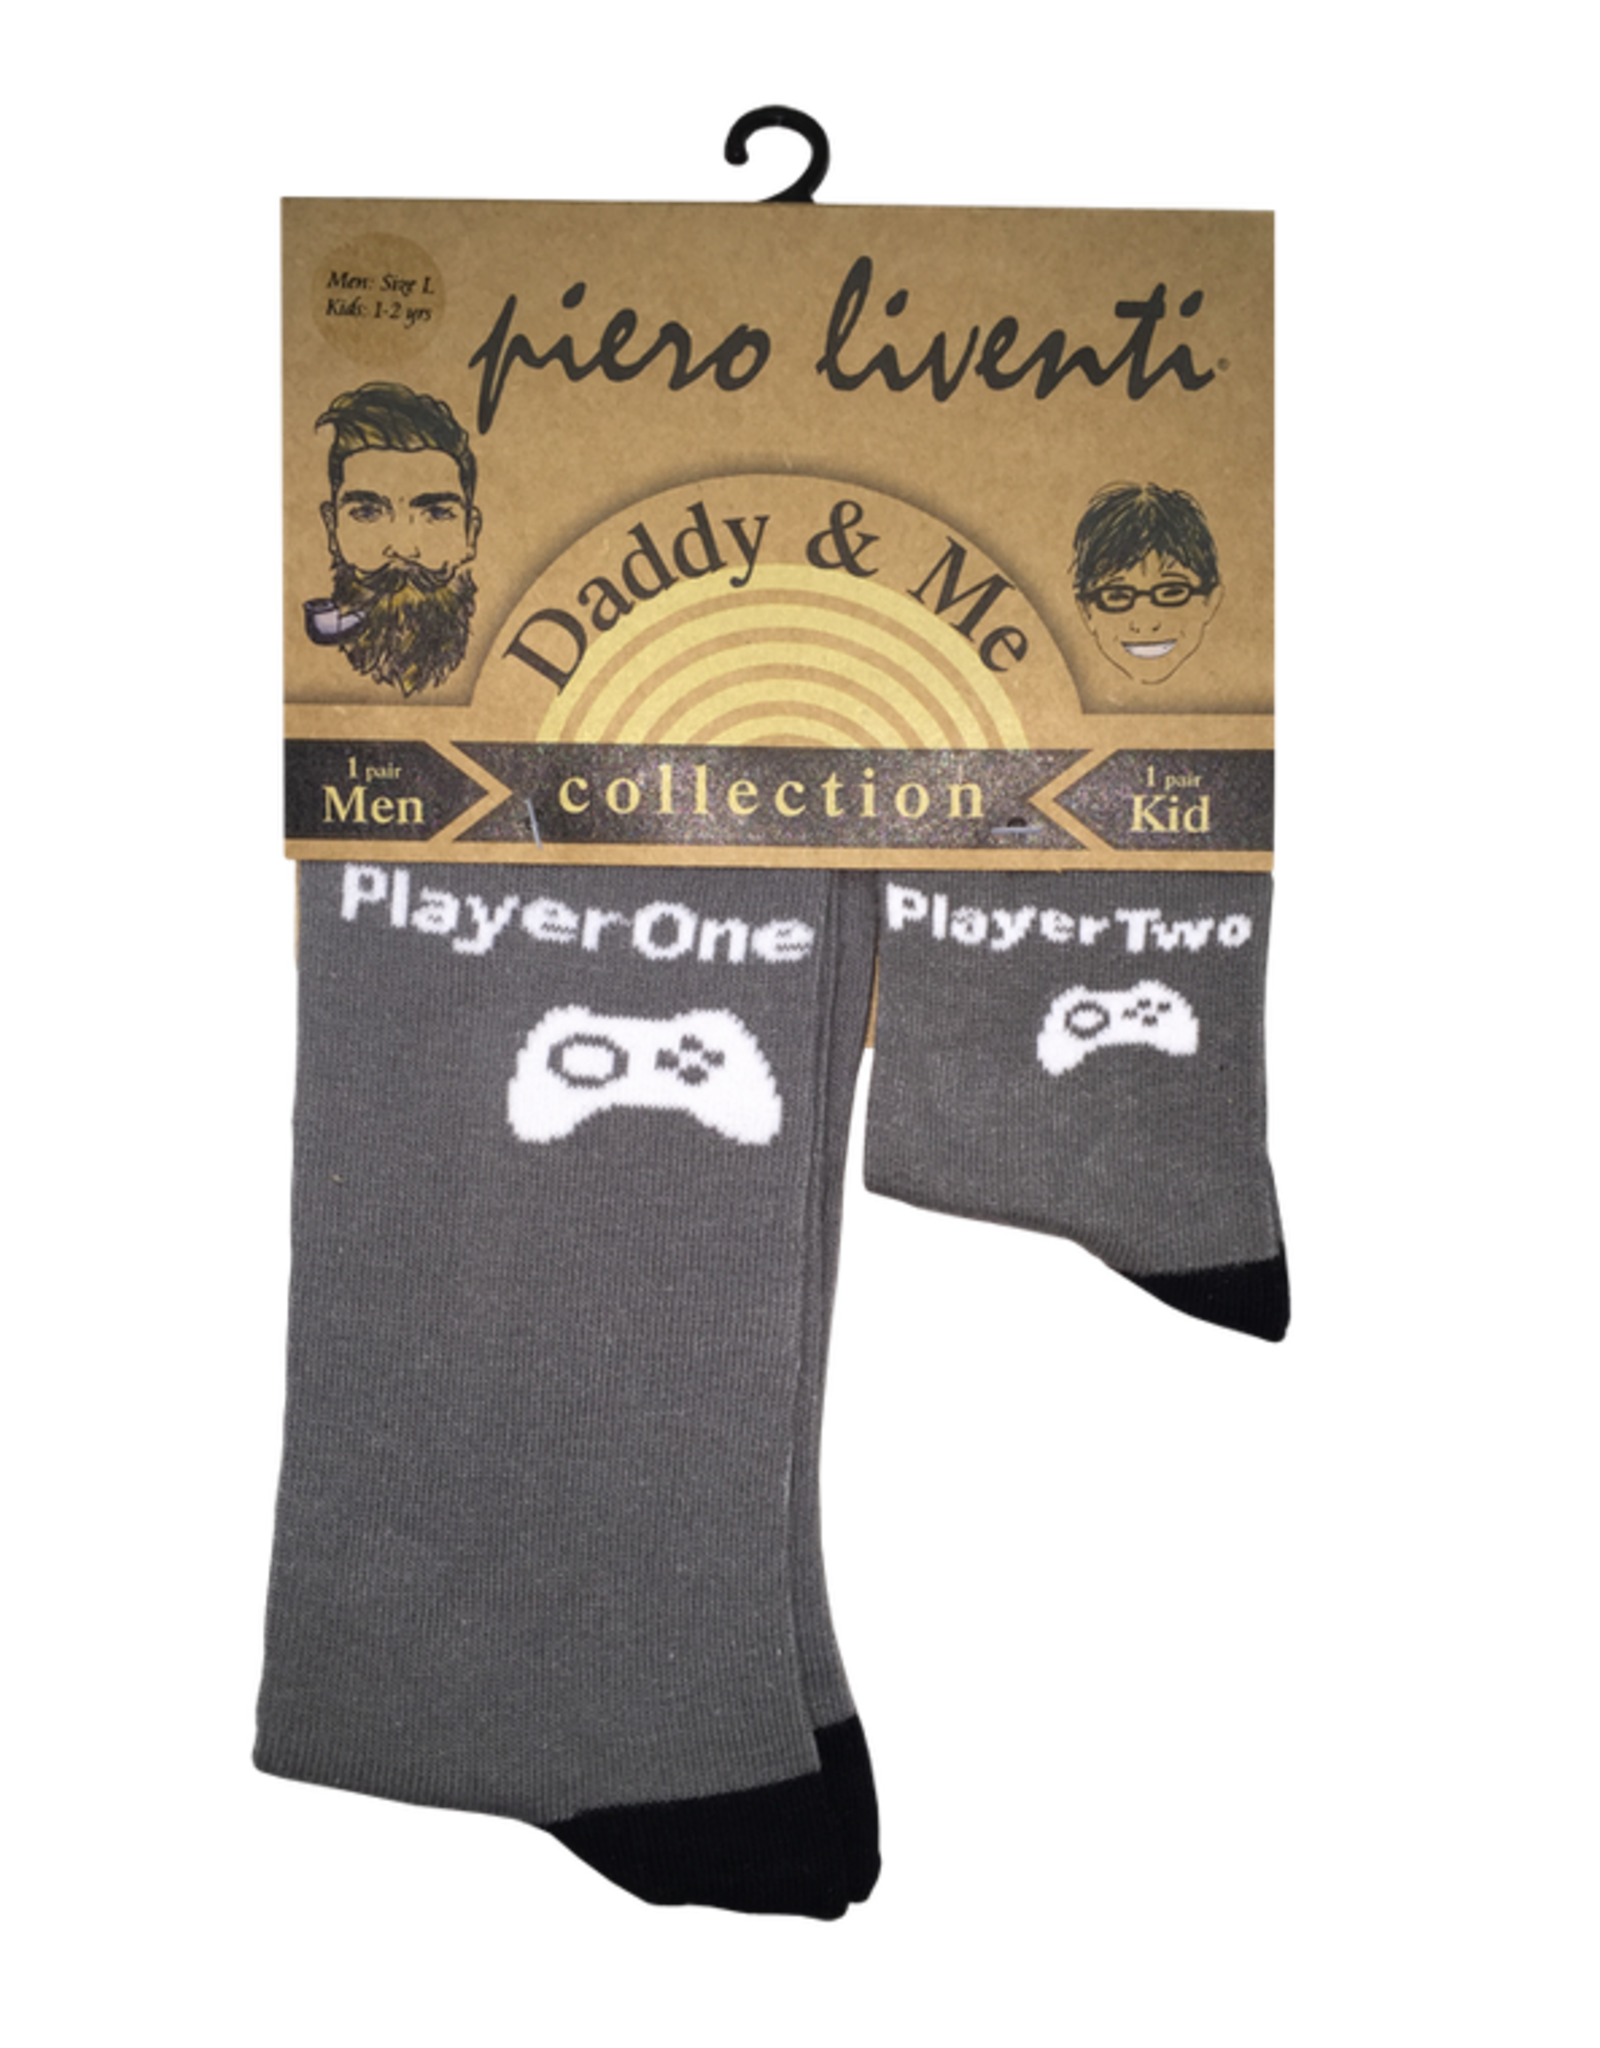 Piero Liventi Daddy & Me Sock Set - Player One/Two